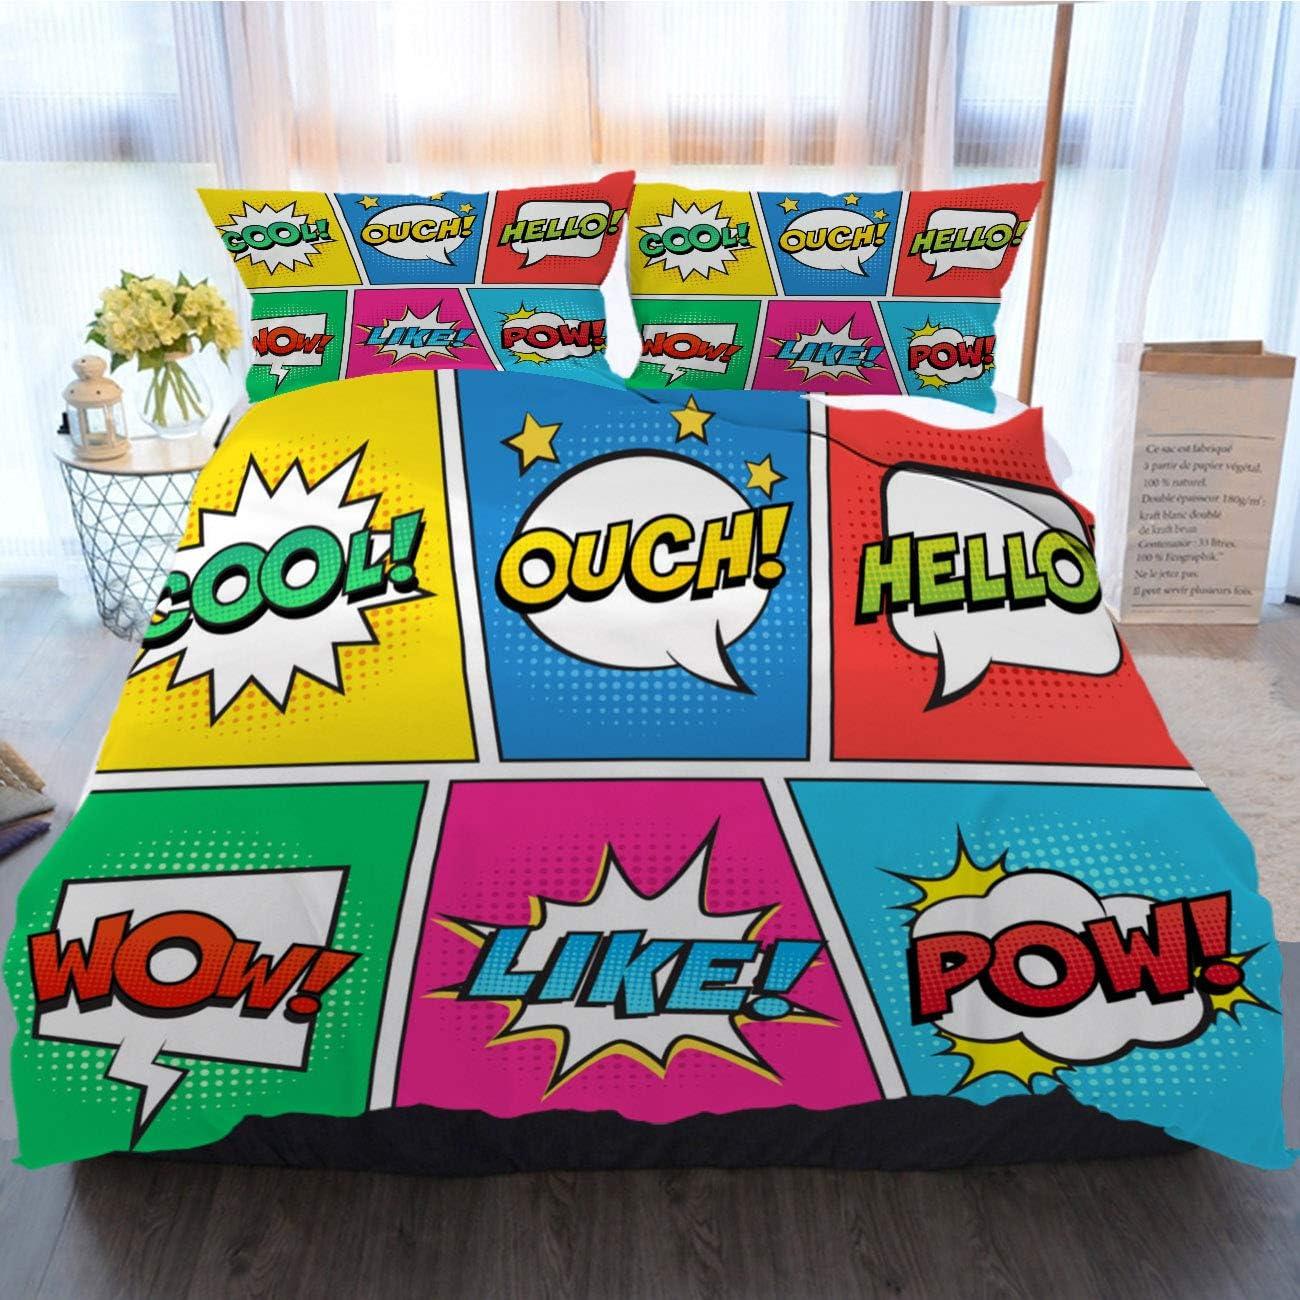 OTTOSUN Retro Bedding 3 Piece Duvet Cover Sets,Retro Comic Speech Bubbles Set On Colorful Background Expression,Home Luxury Soft Duvet Comforter Cover,King